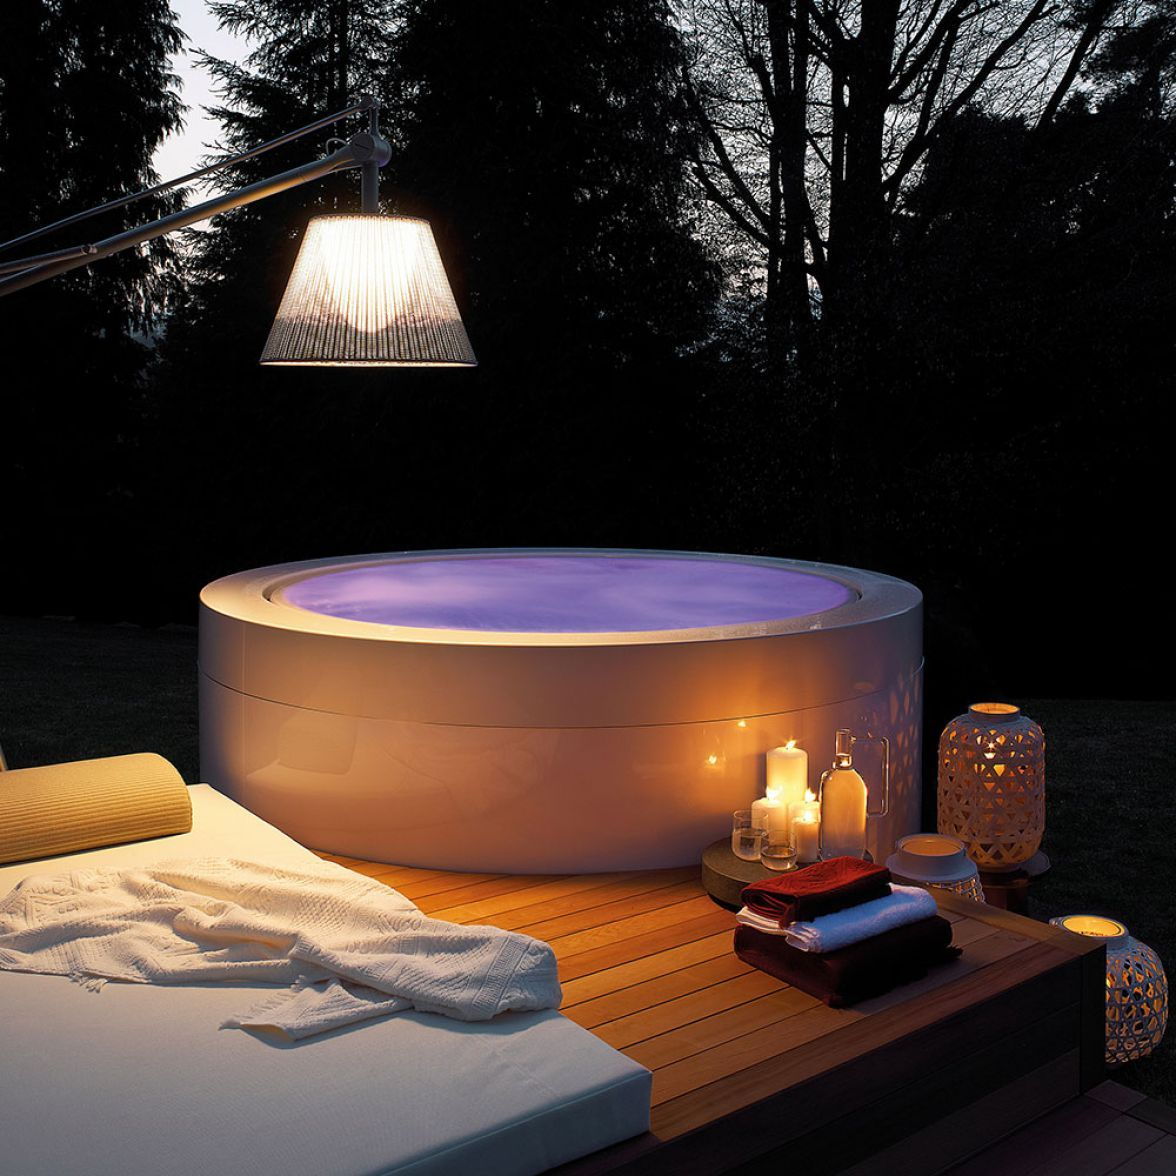 Zen Pool Deck фото цена